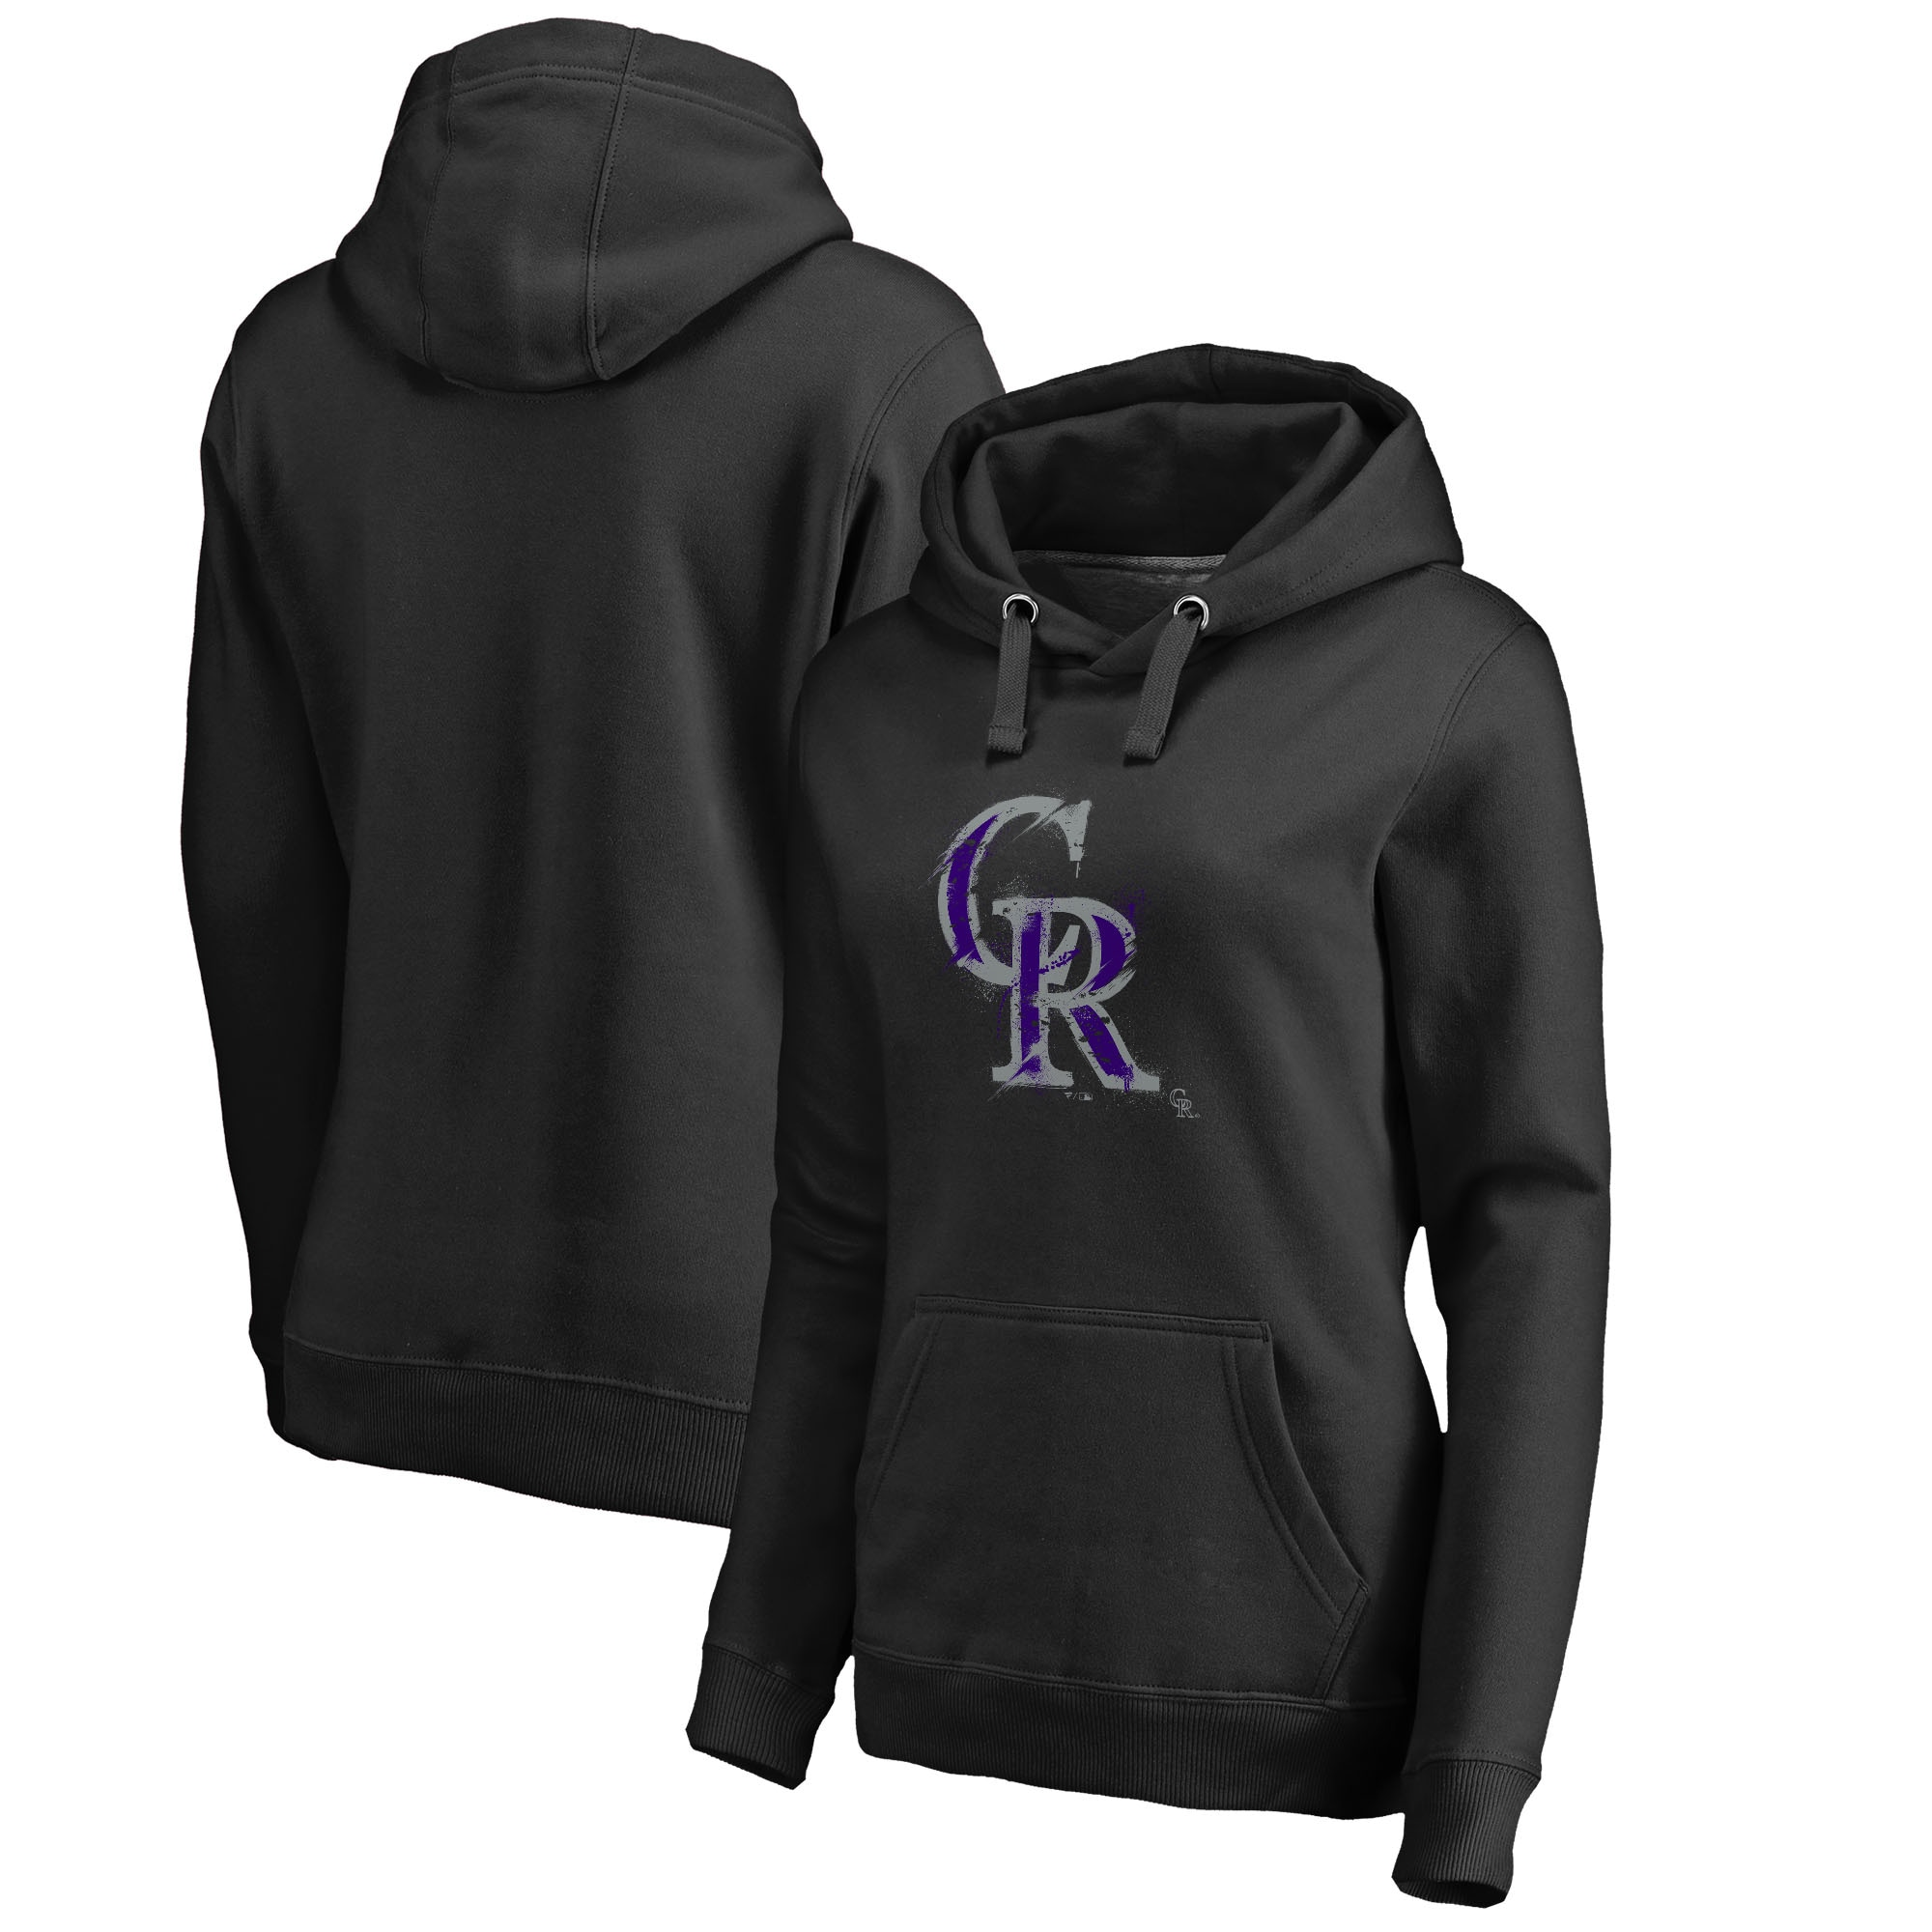 Colorado Rockies Fanatics Branded Women's Splatter Logo Pullover Hoodie - Black